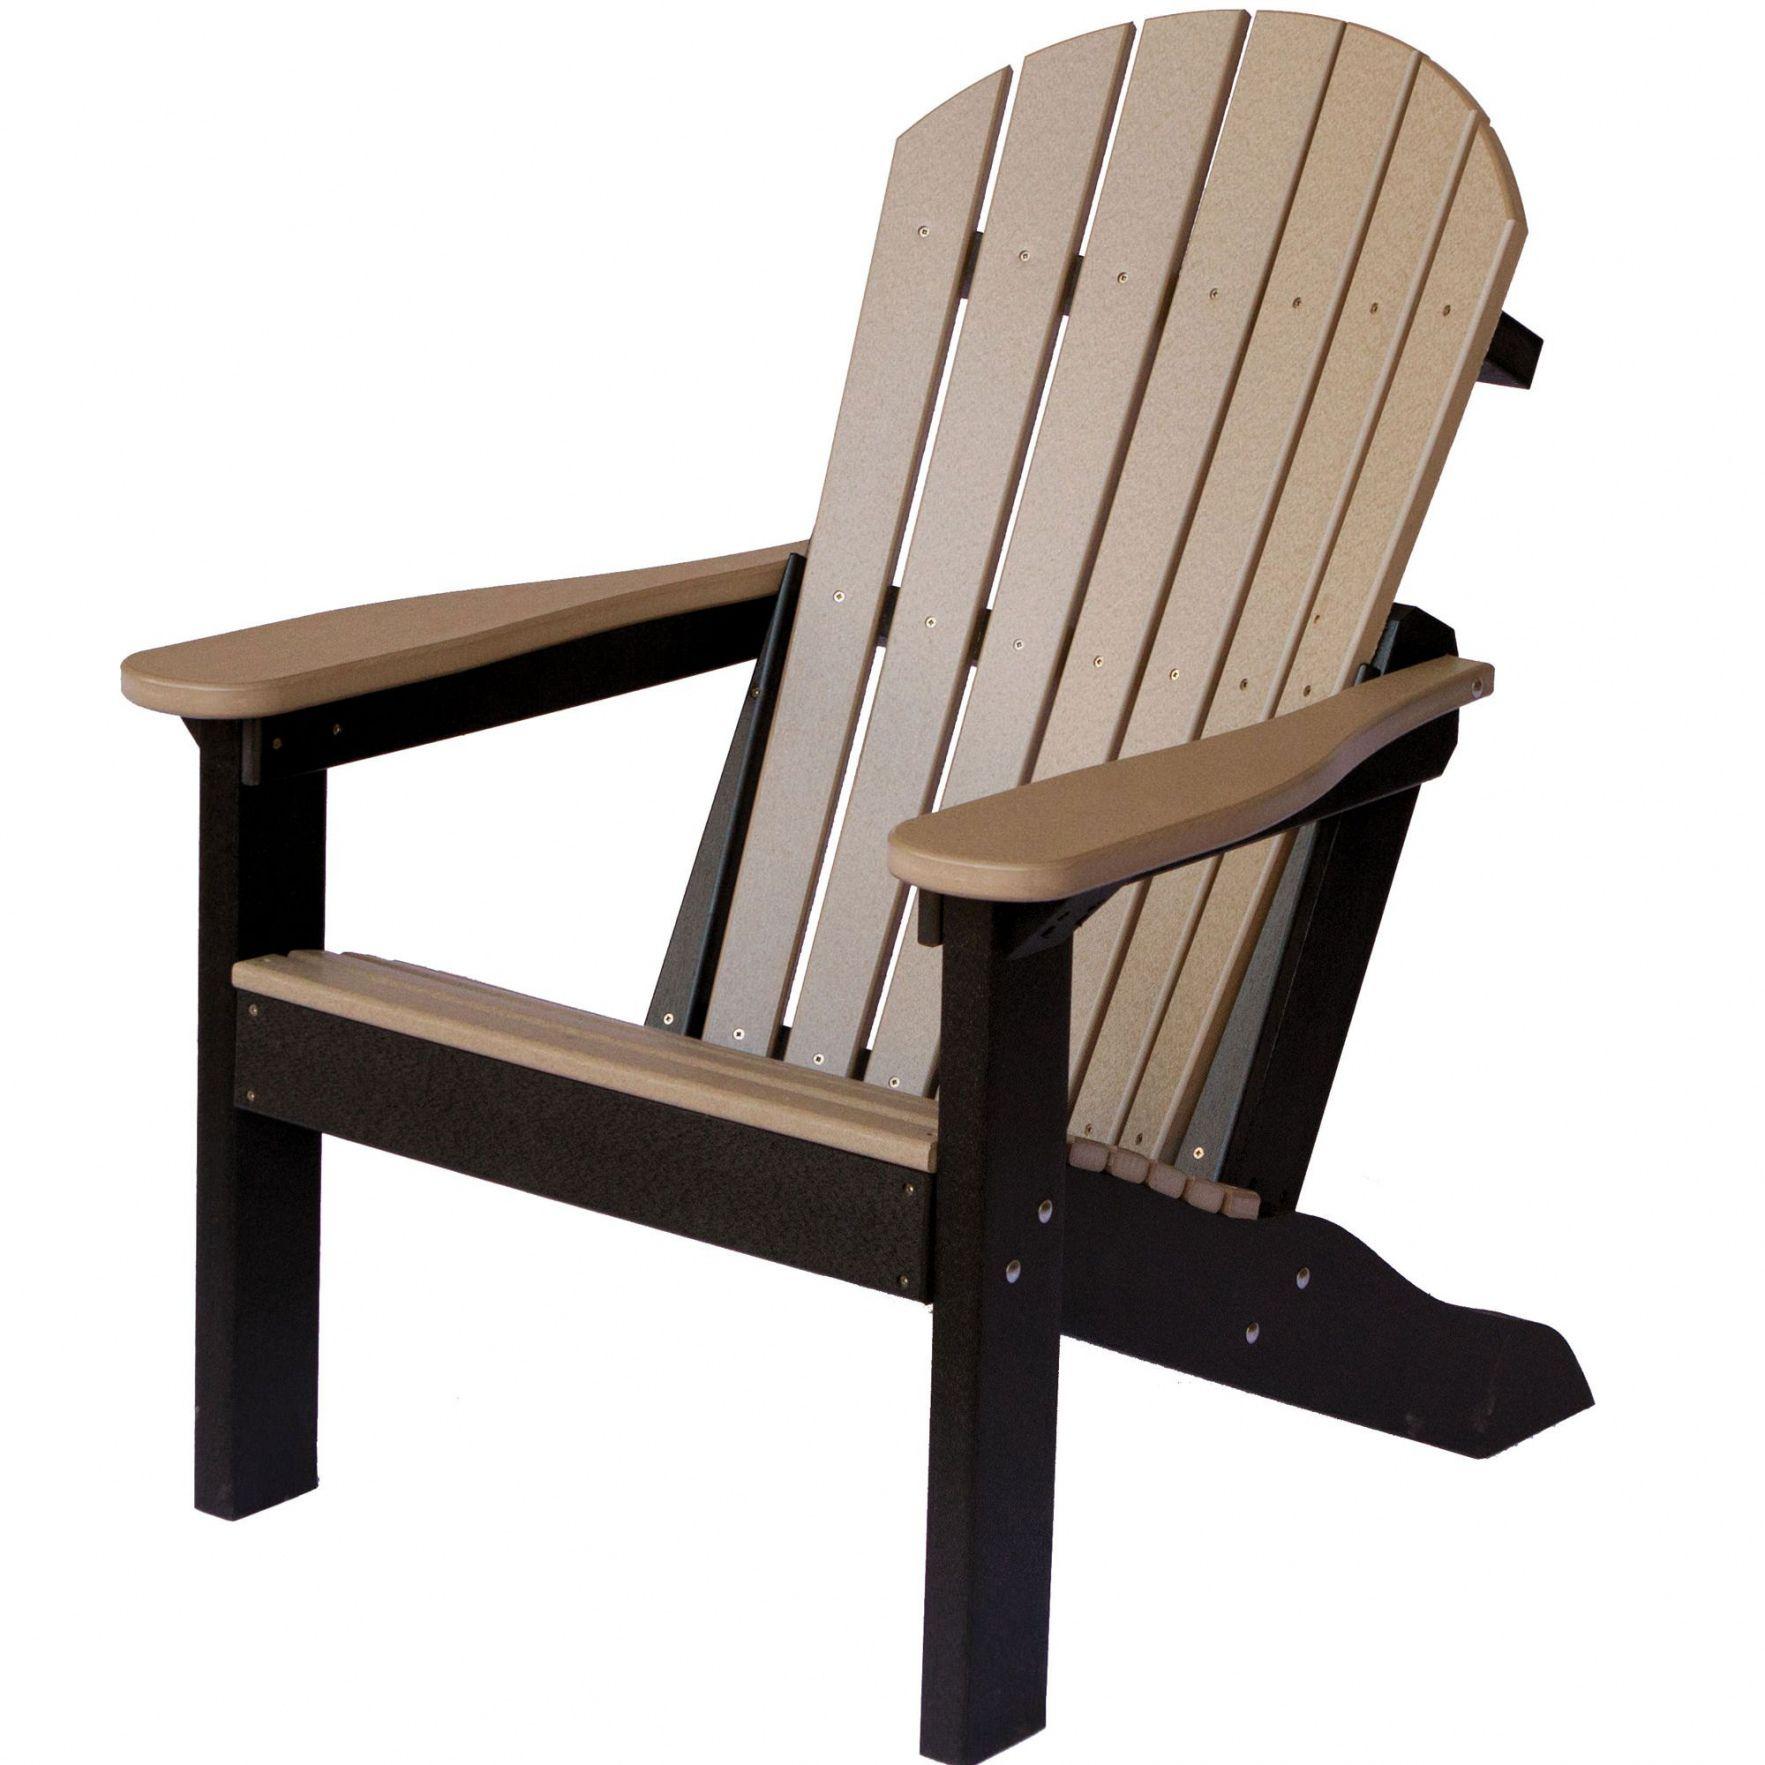 55+ Navy Blue Plastic Adirondack Chairs Best Way to